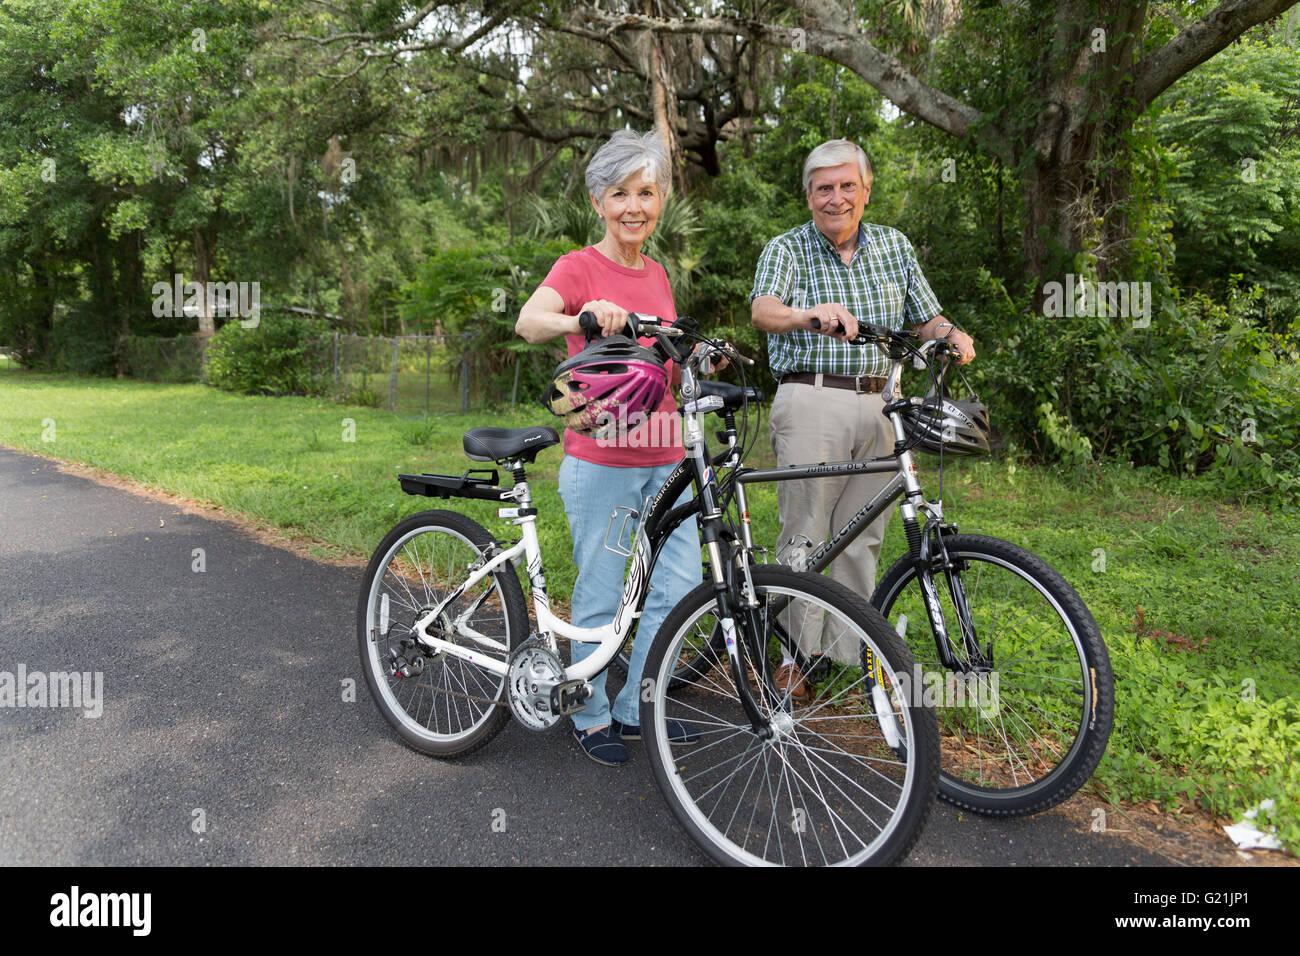 Senior couple riding bicycles Photo Stock